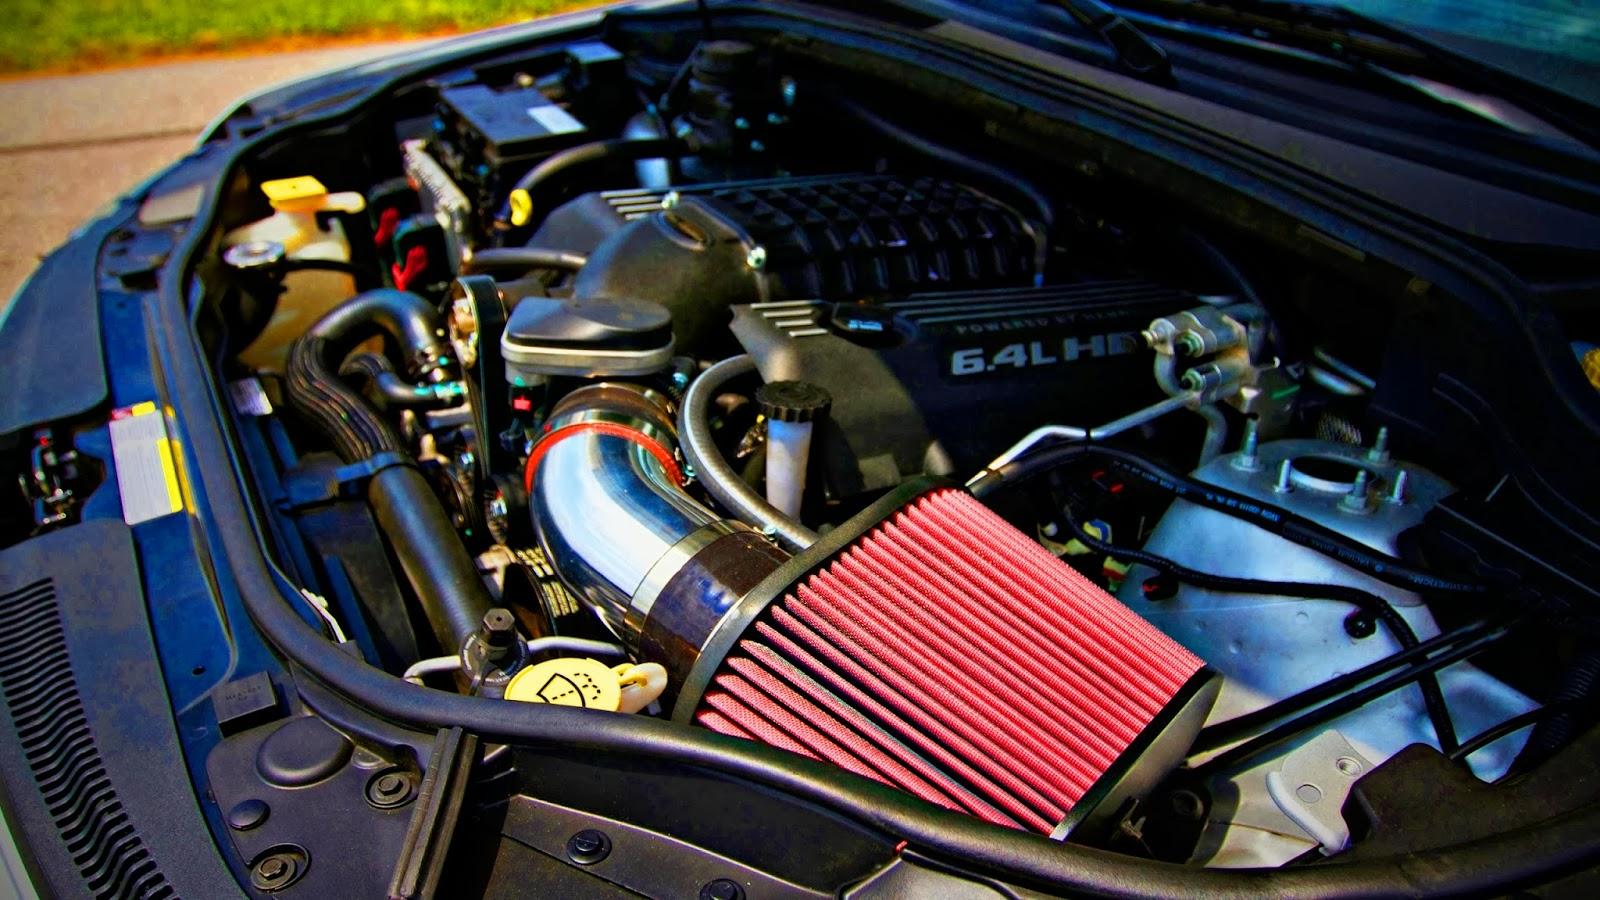 2013 Jeep Srt8 Magnuson Supercharger Update | Apps Directories